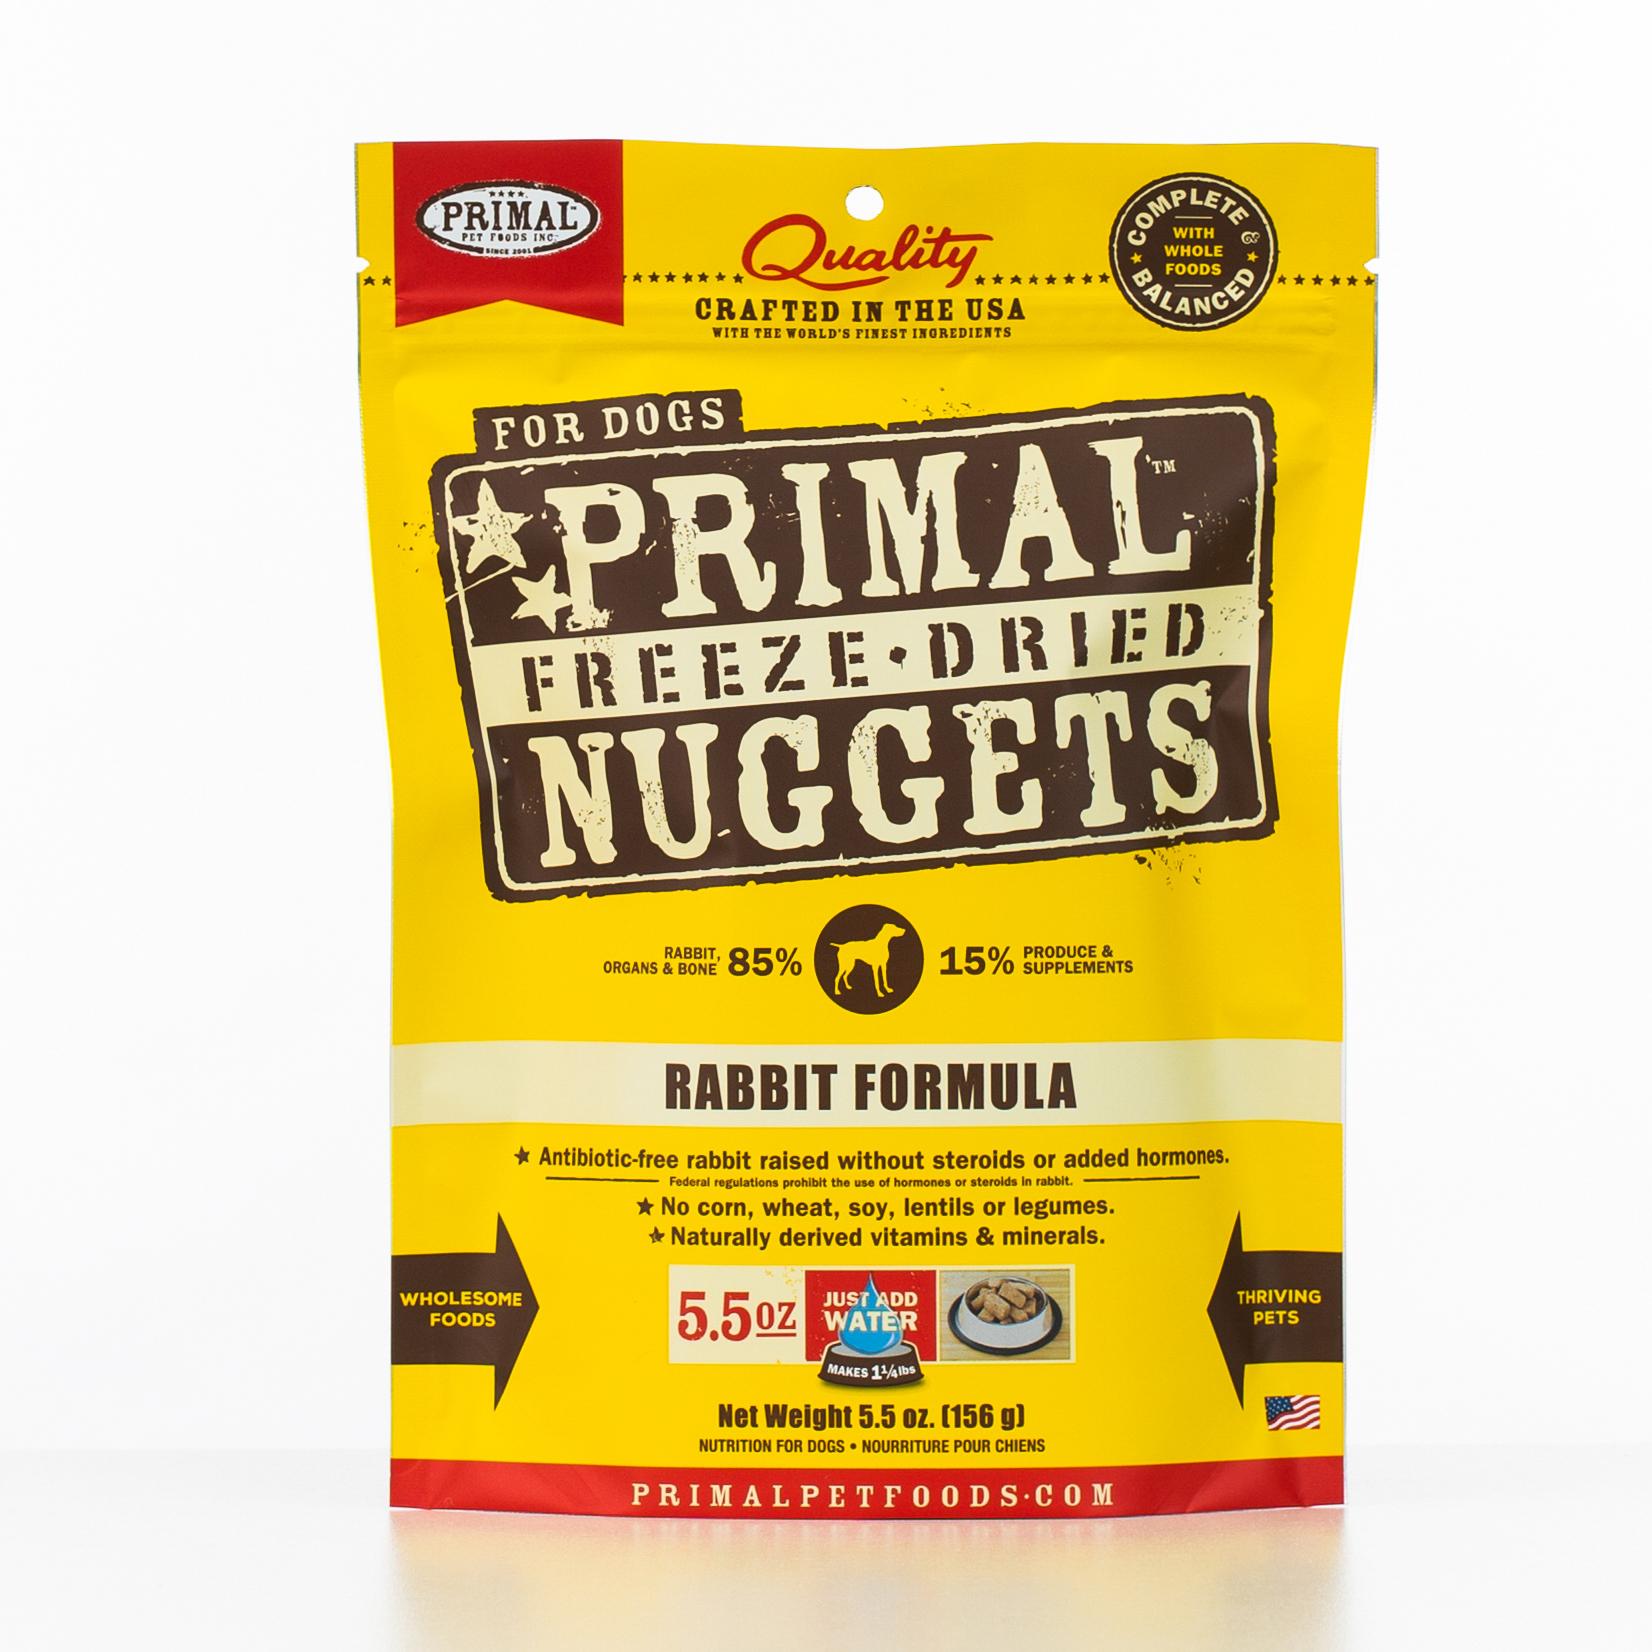 Primal Raw Freeze-Dried Nuggets Rabbit Formula Dog Food, 5.5-oz bag